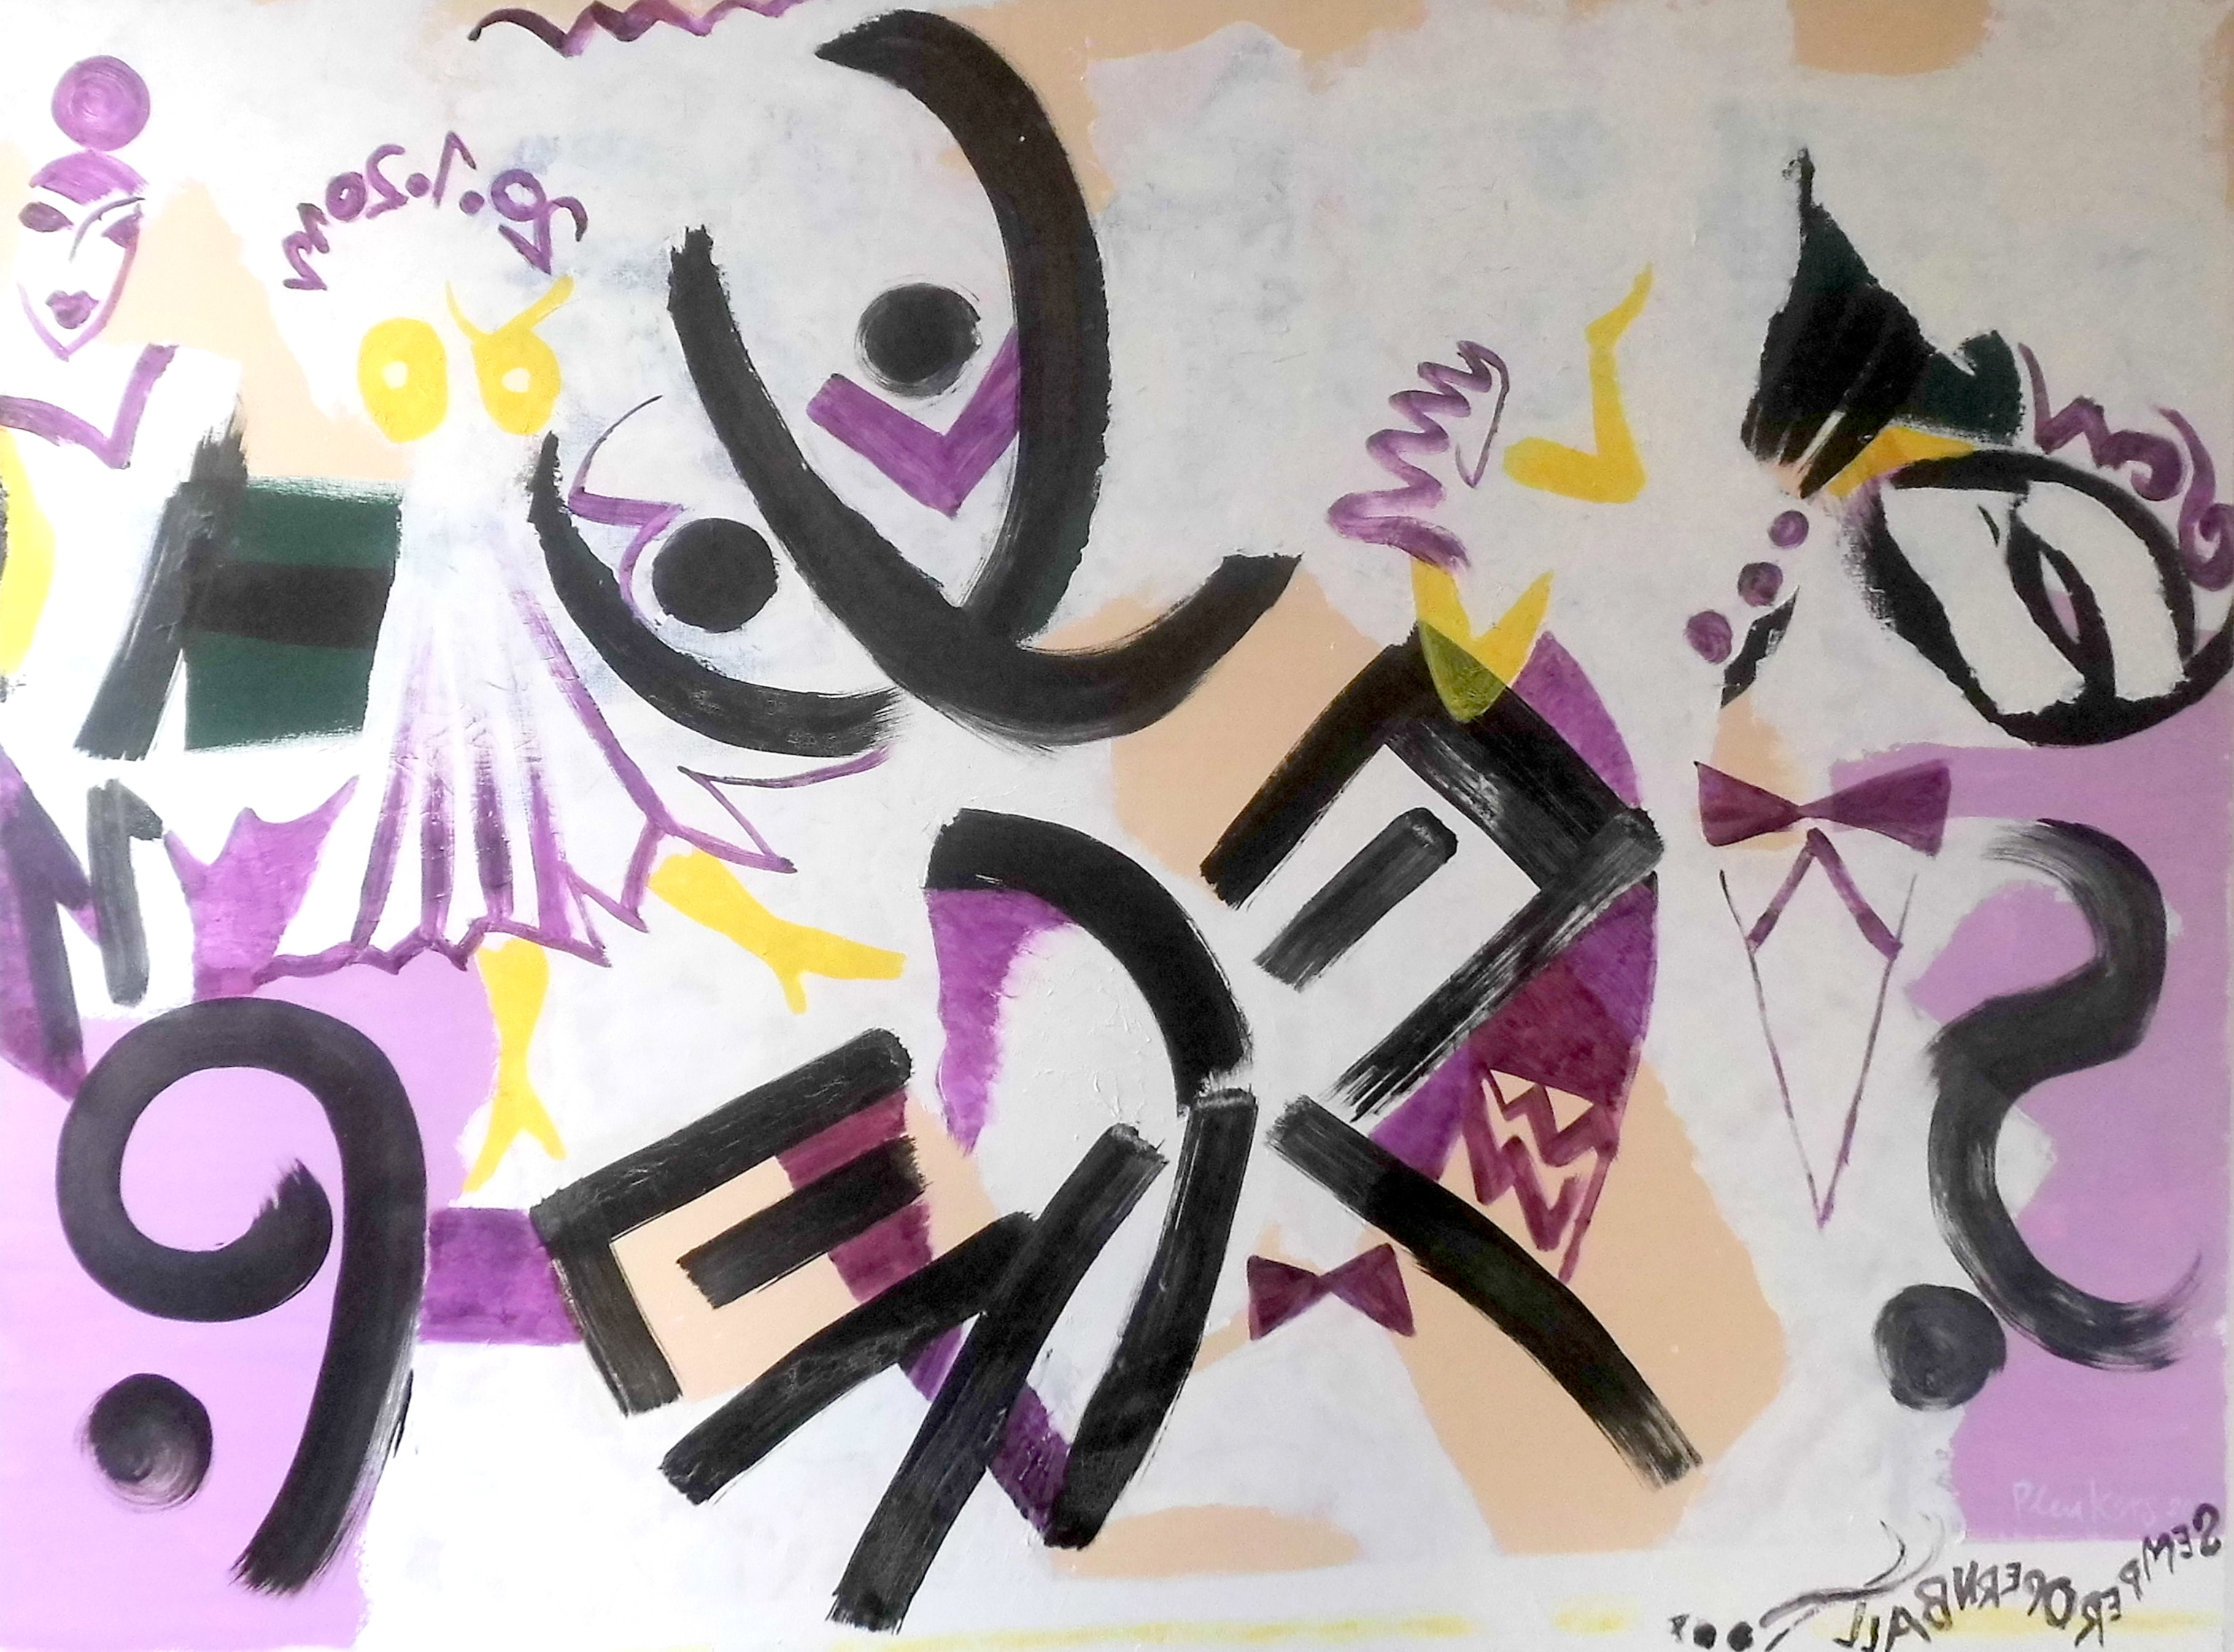 10-stefan_plenkers-semperopernball-2011-acryl_oel_auf_leinwand-160x200